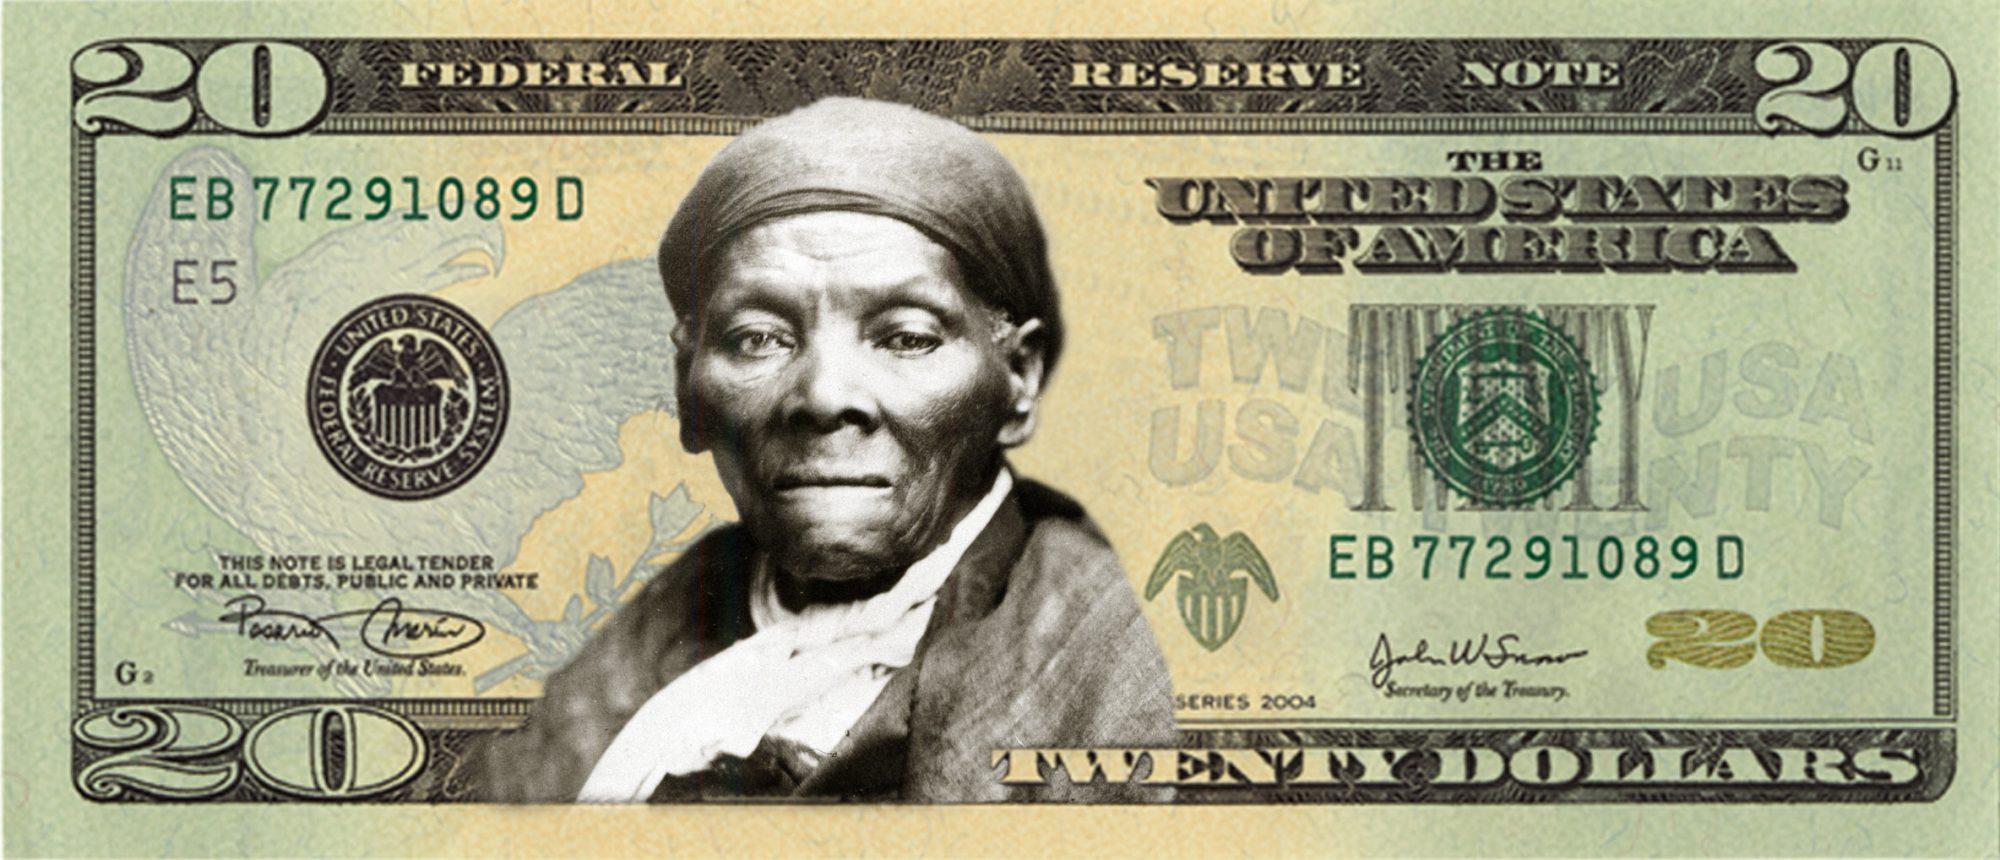 Harriet Tubman $20 bill